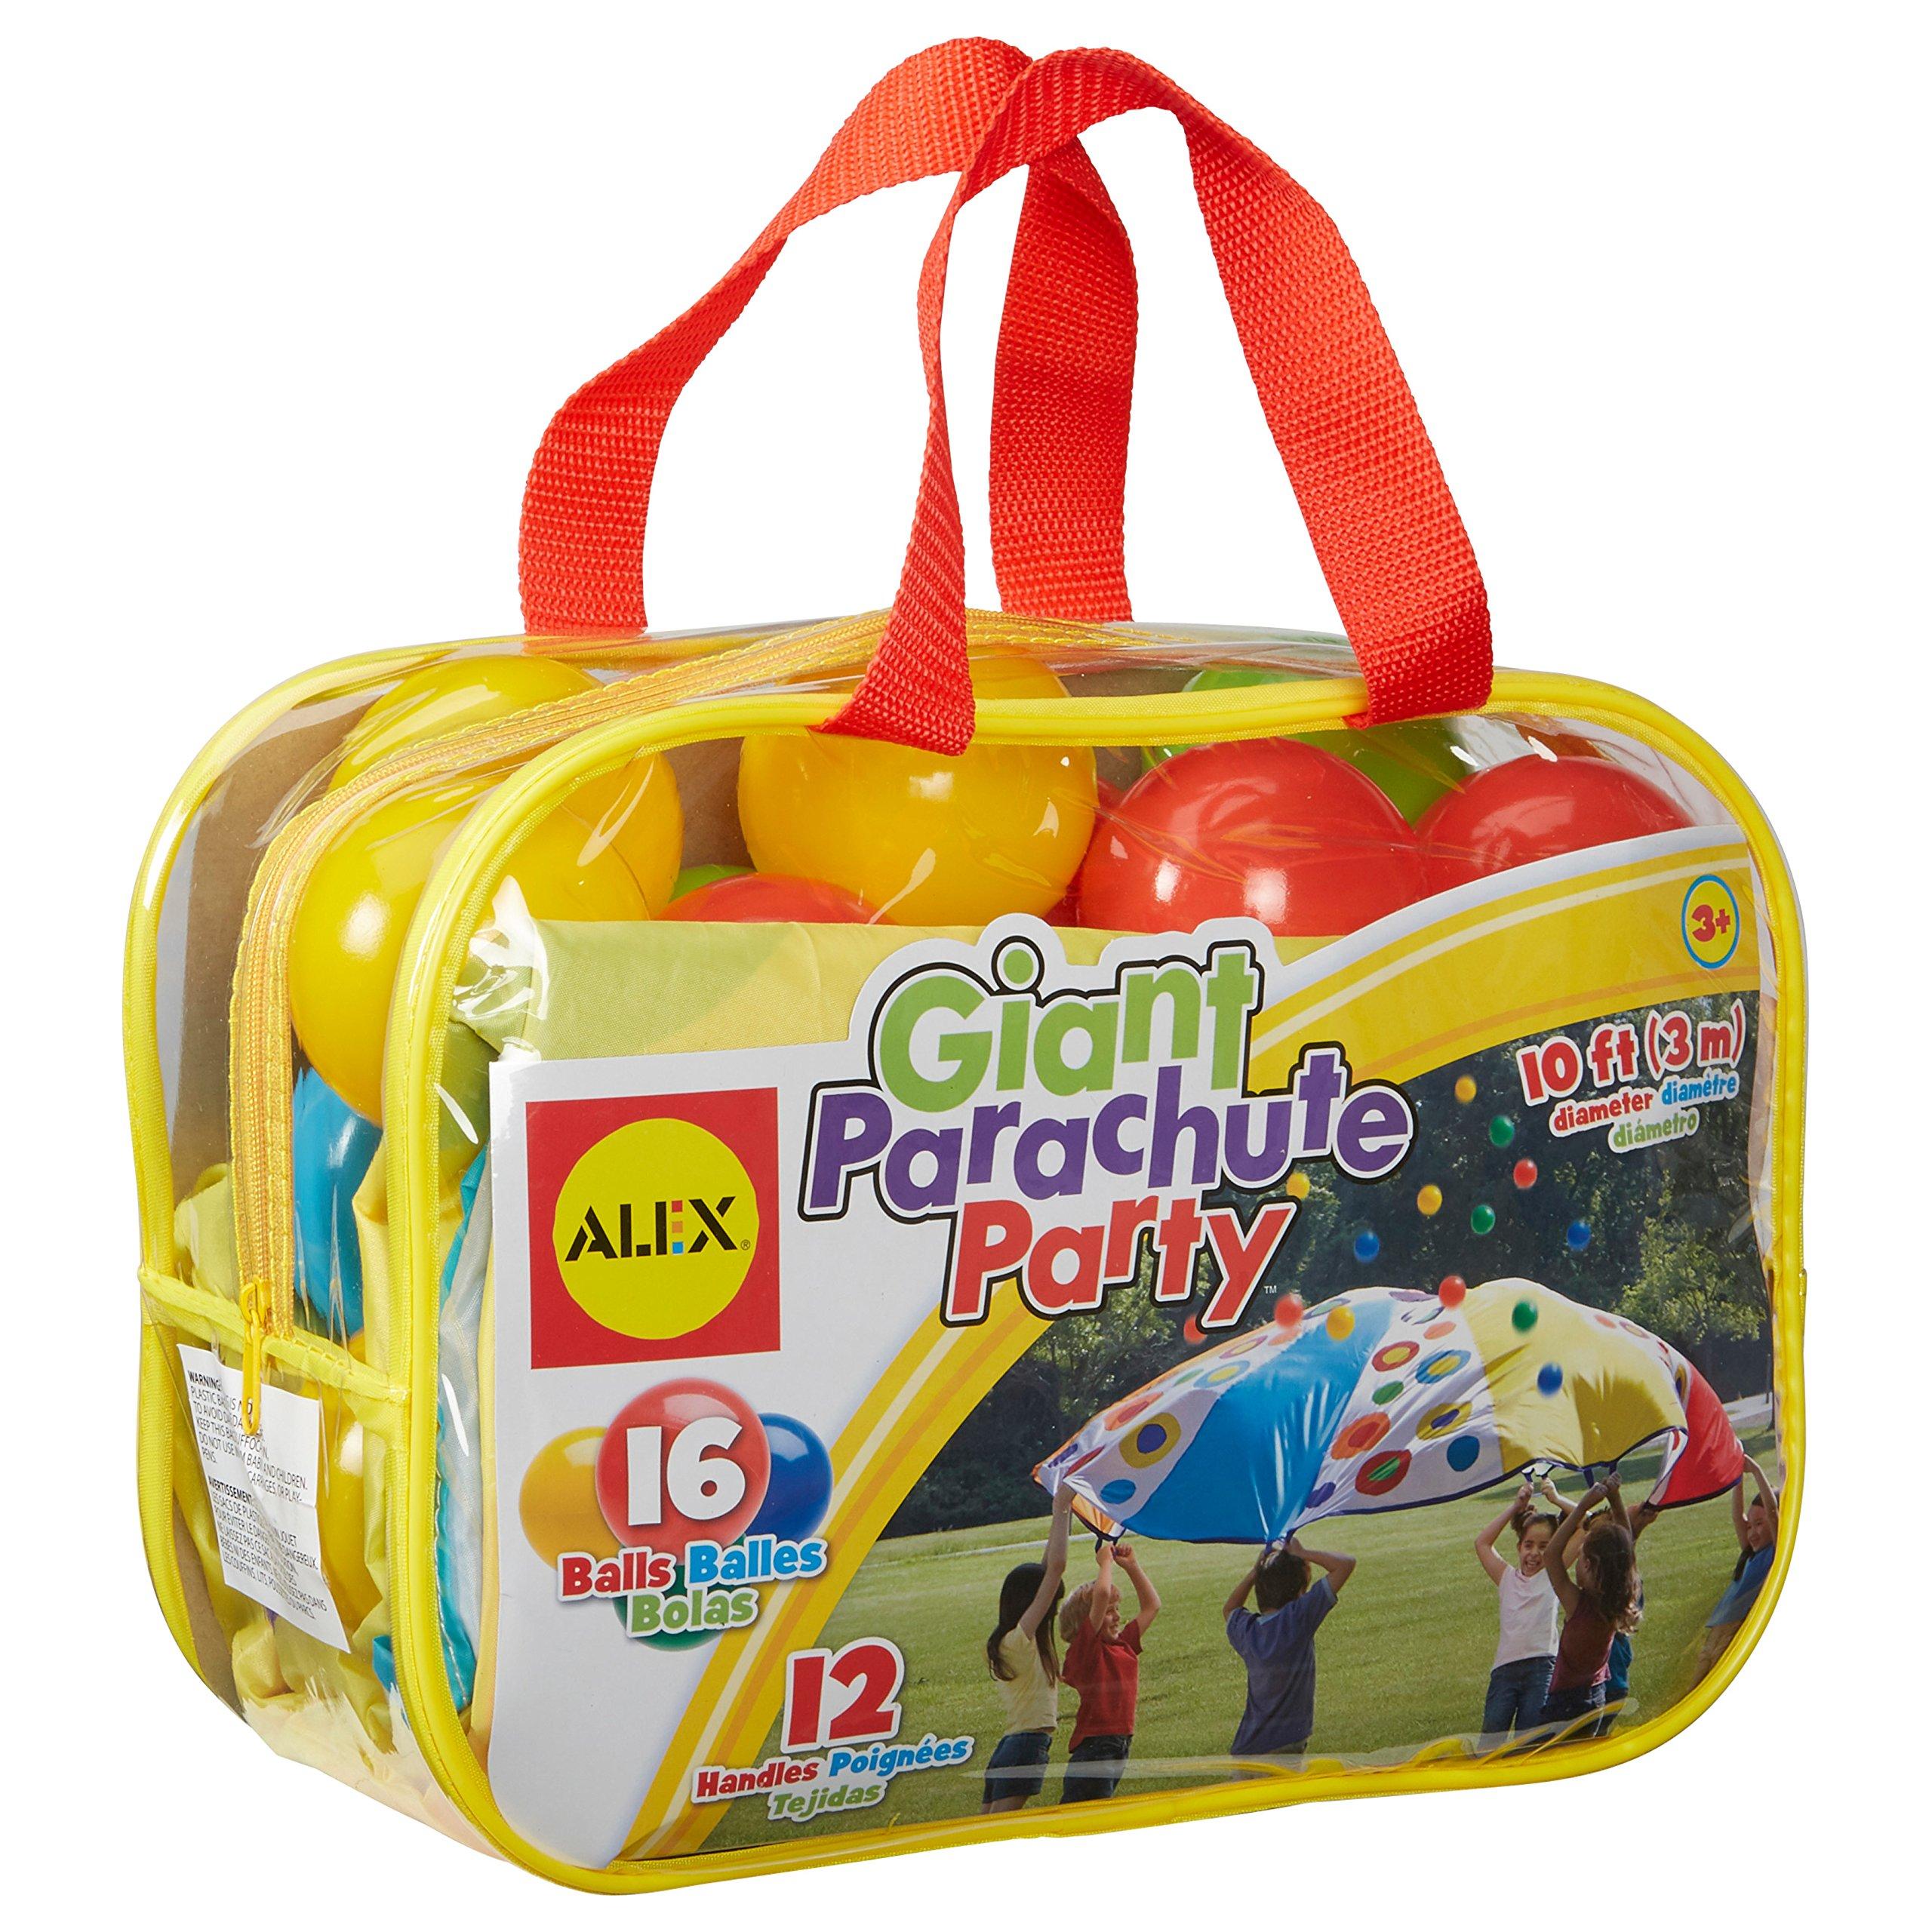 ALEX Toys Active Play Giant Parachute Party